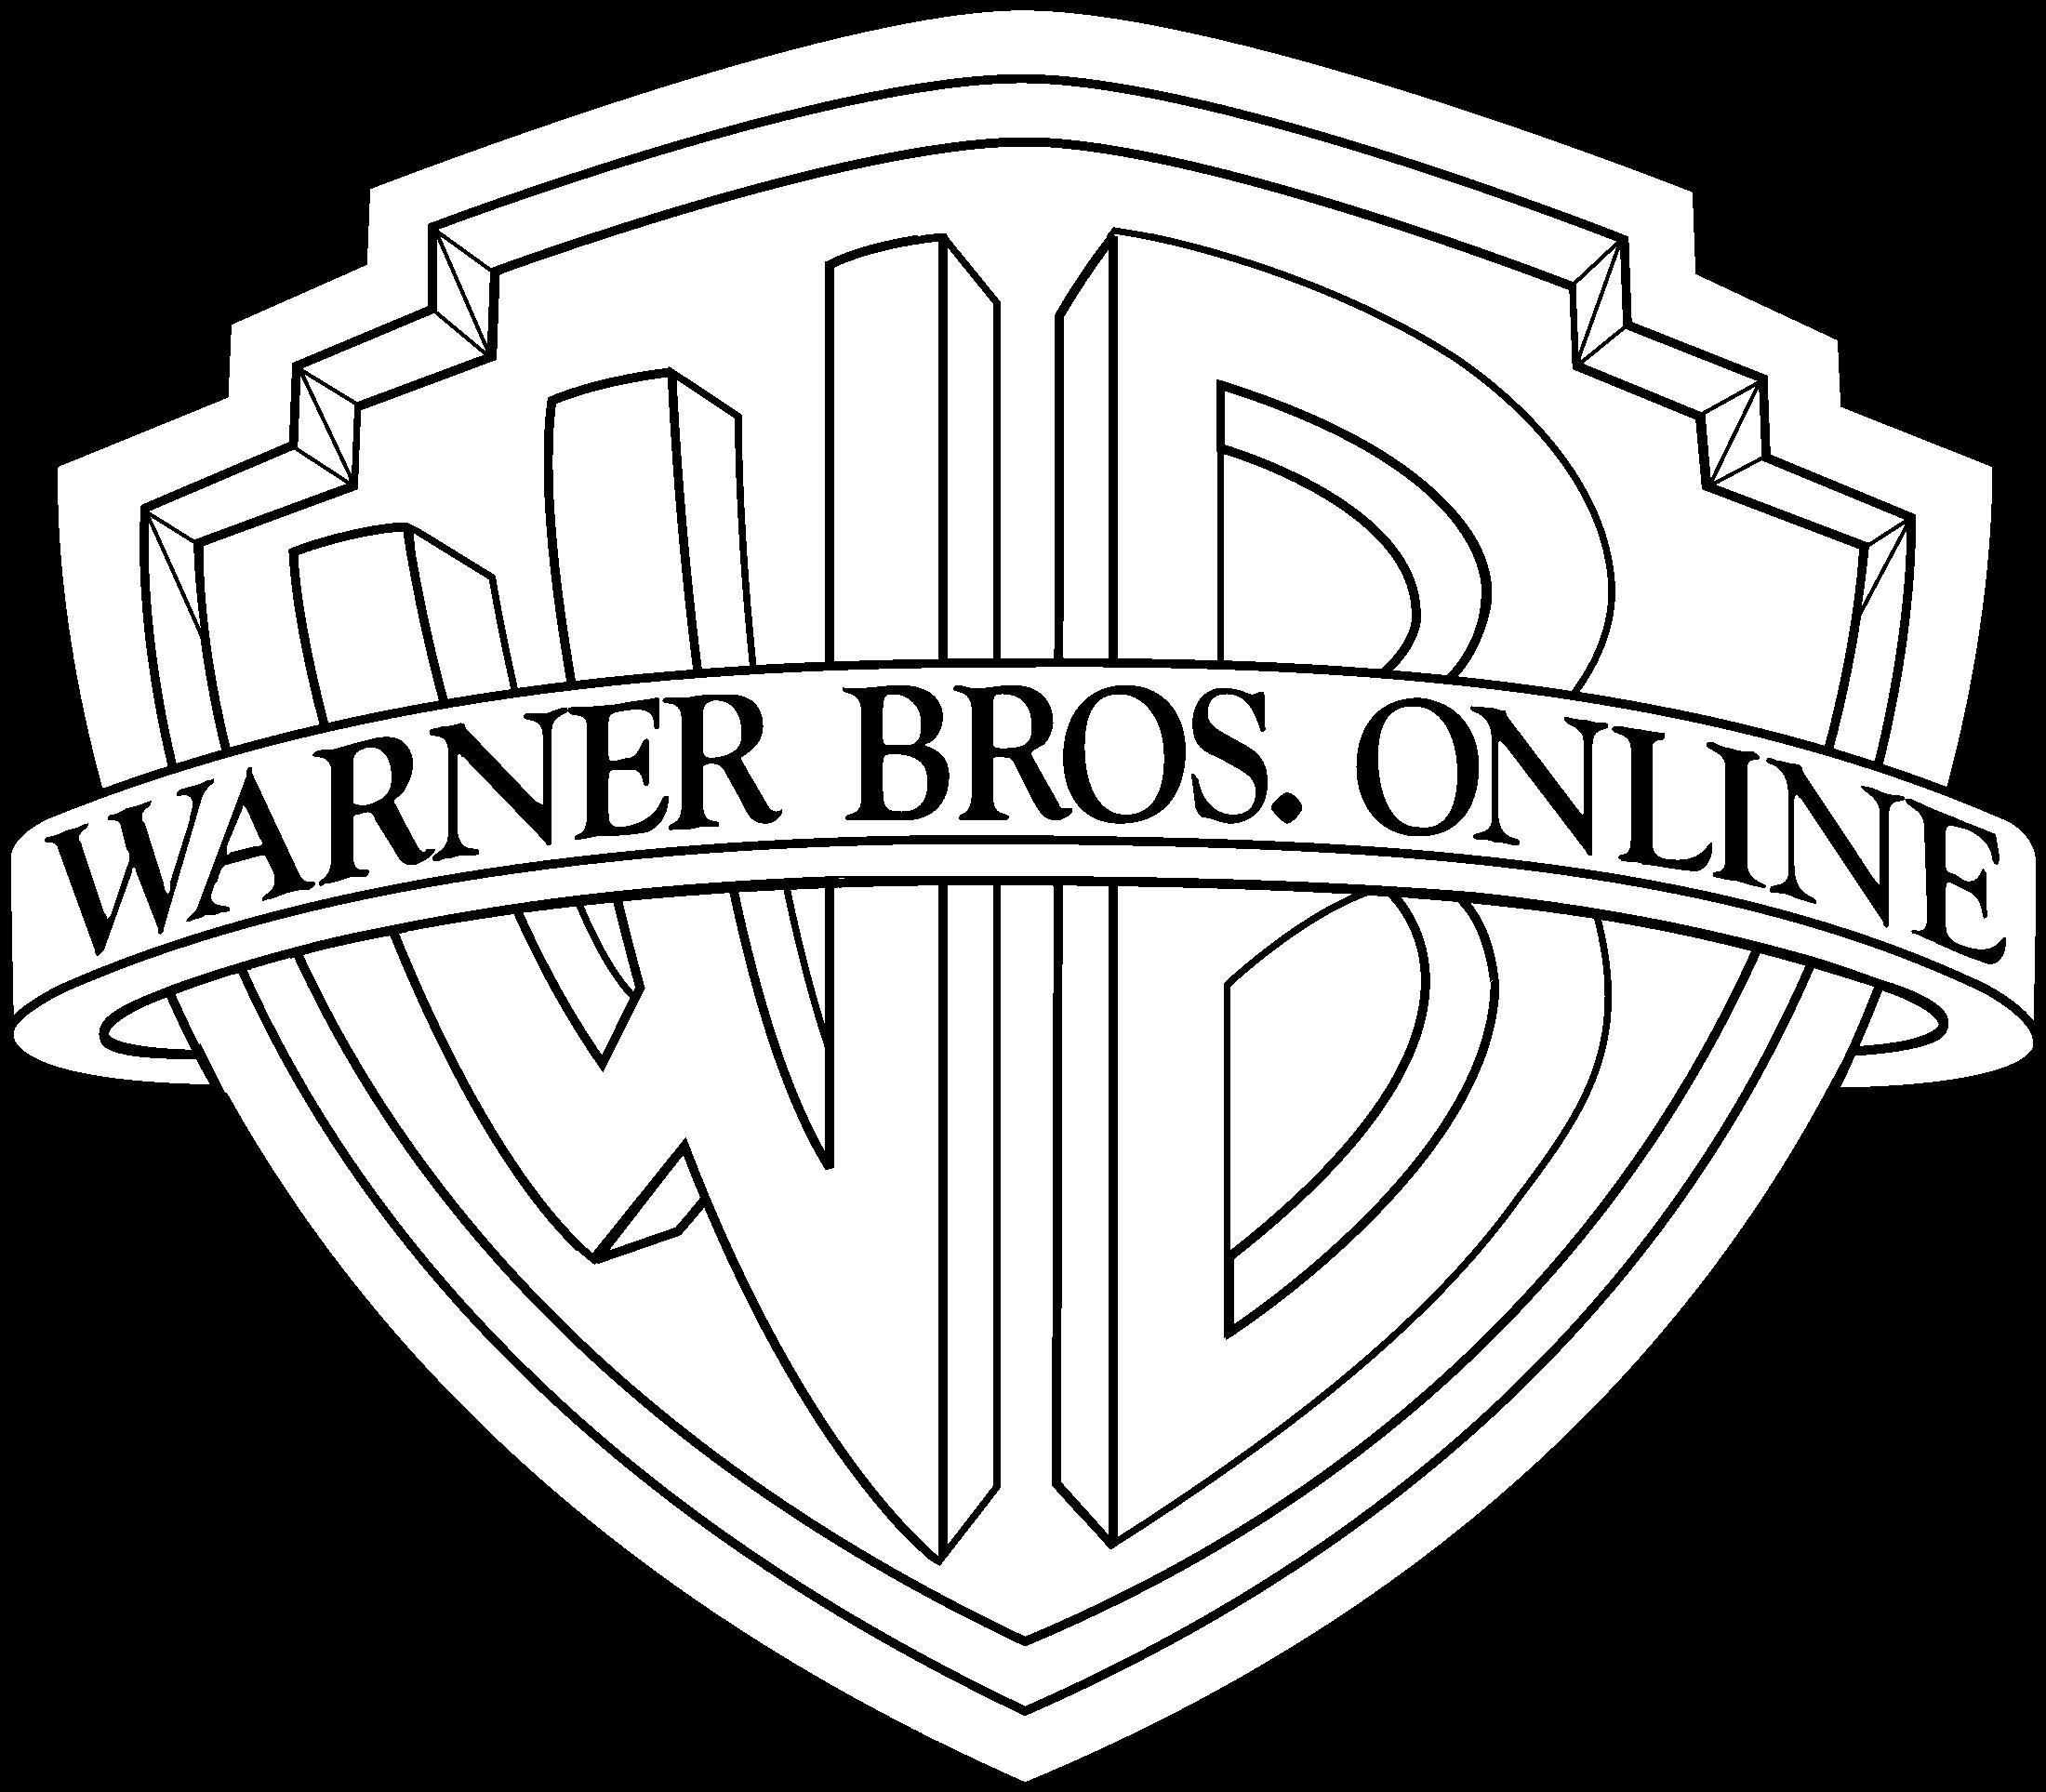 Warner bros black beauty download, duct tape naked